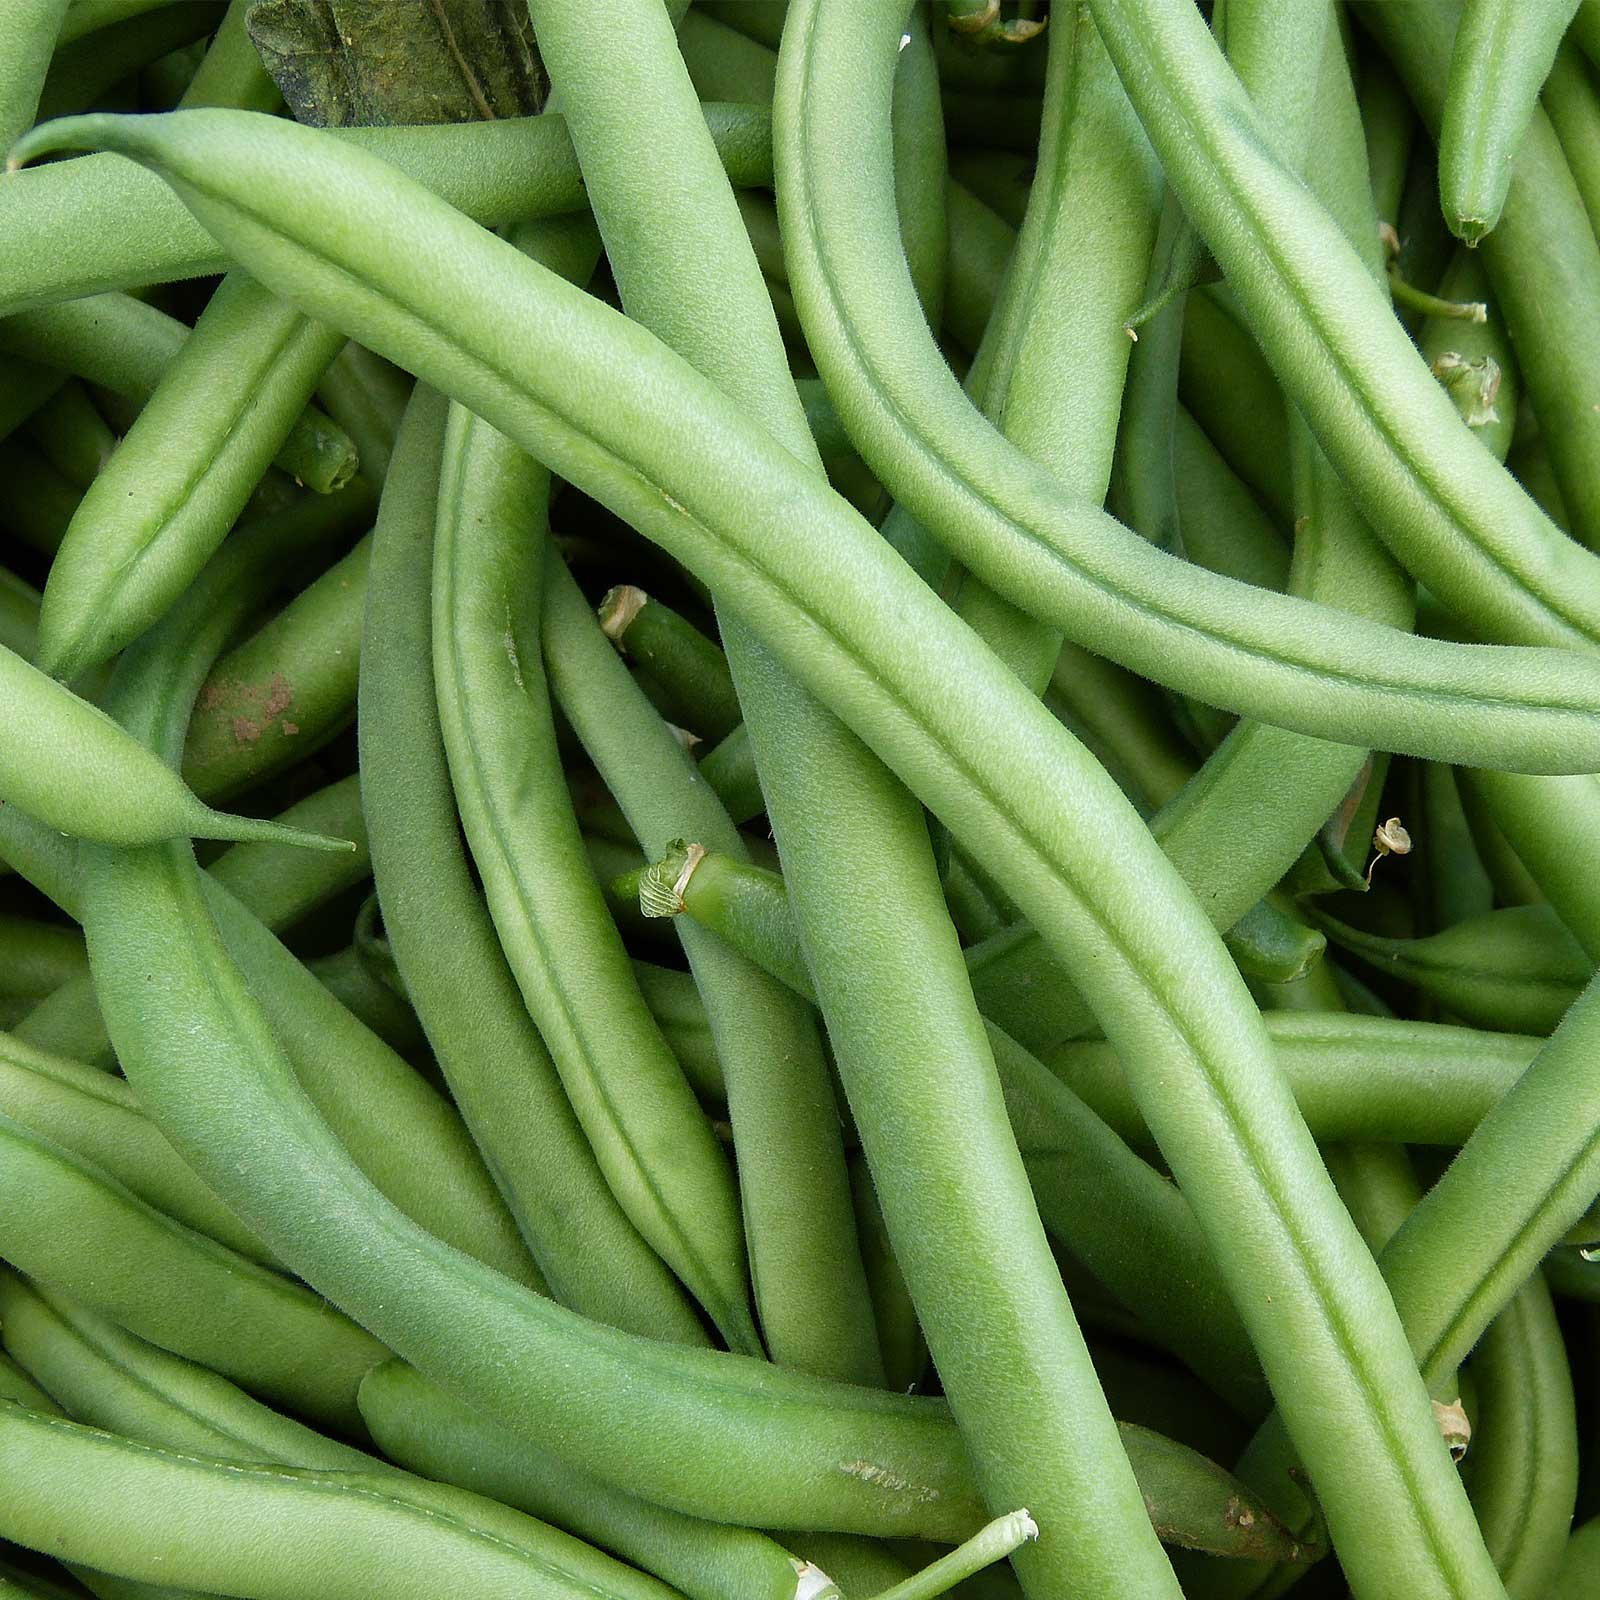 Blue Lake FM1K Pole Bean Seeds (Treated) - 25 Lb Bulk - Non-GMO, Heirloom - Green Bean Vegetable Garden Seeds - Phaseolus vulgaris